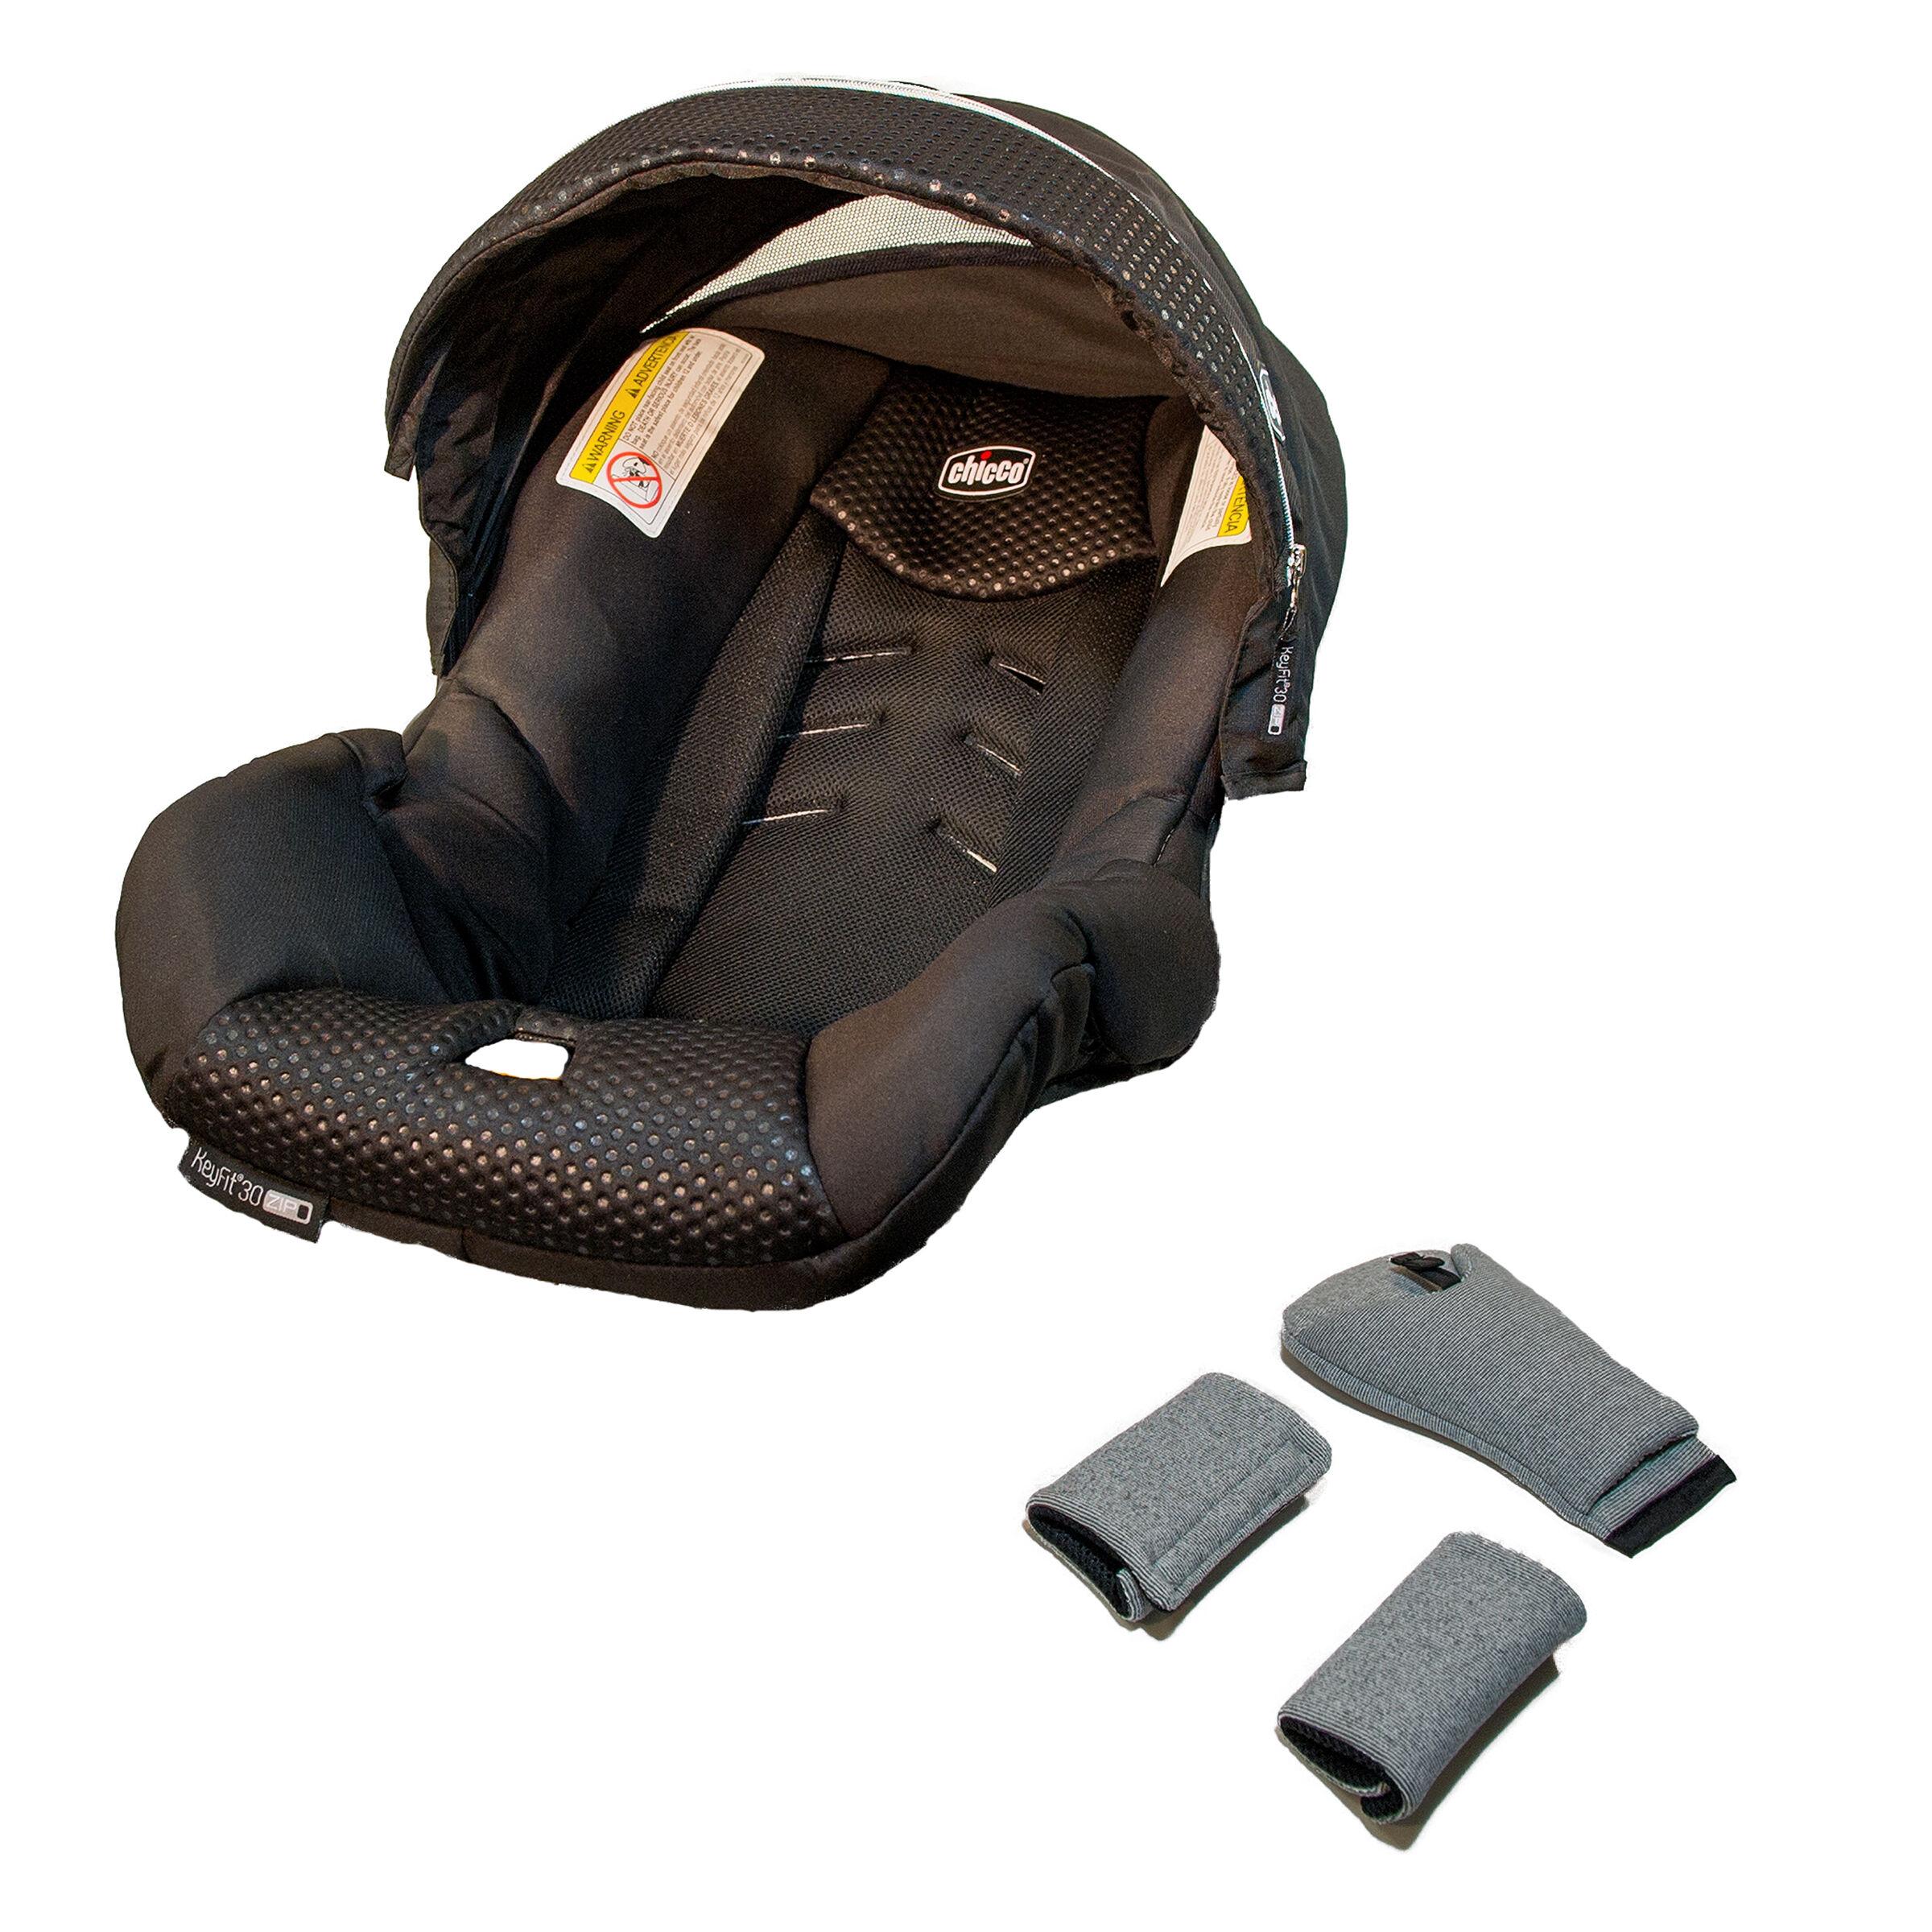 Replacement Insert KeyFit 30 Zip Infant Car Seat Head /& Body Insert Obsidian